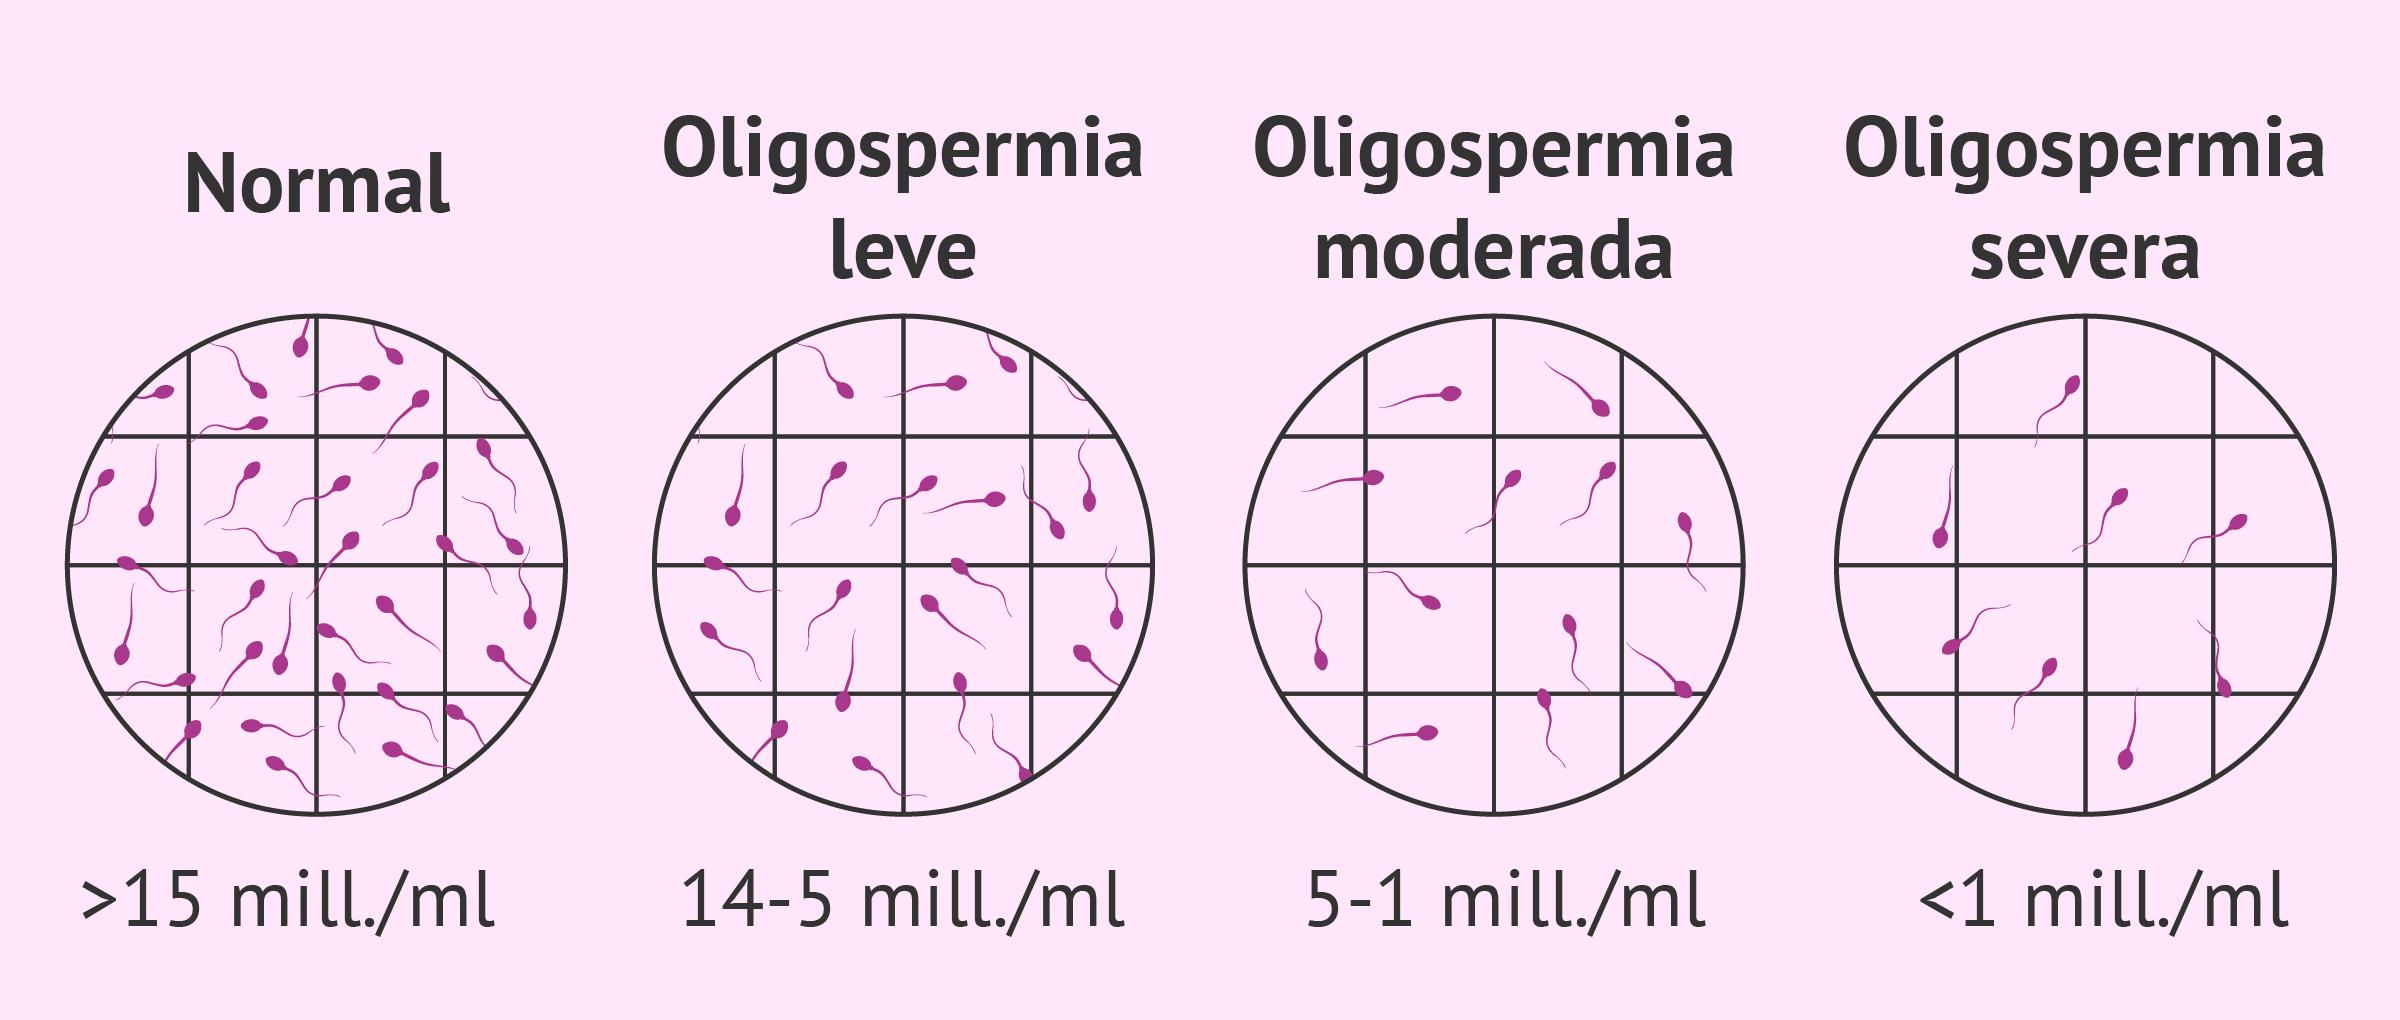 oligospermie severe